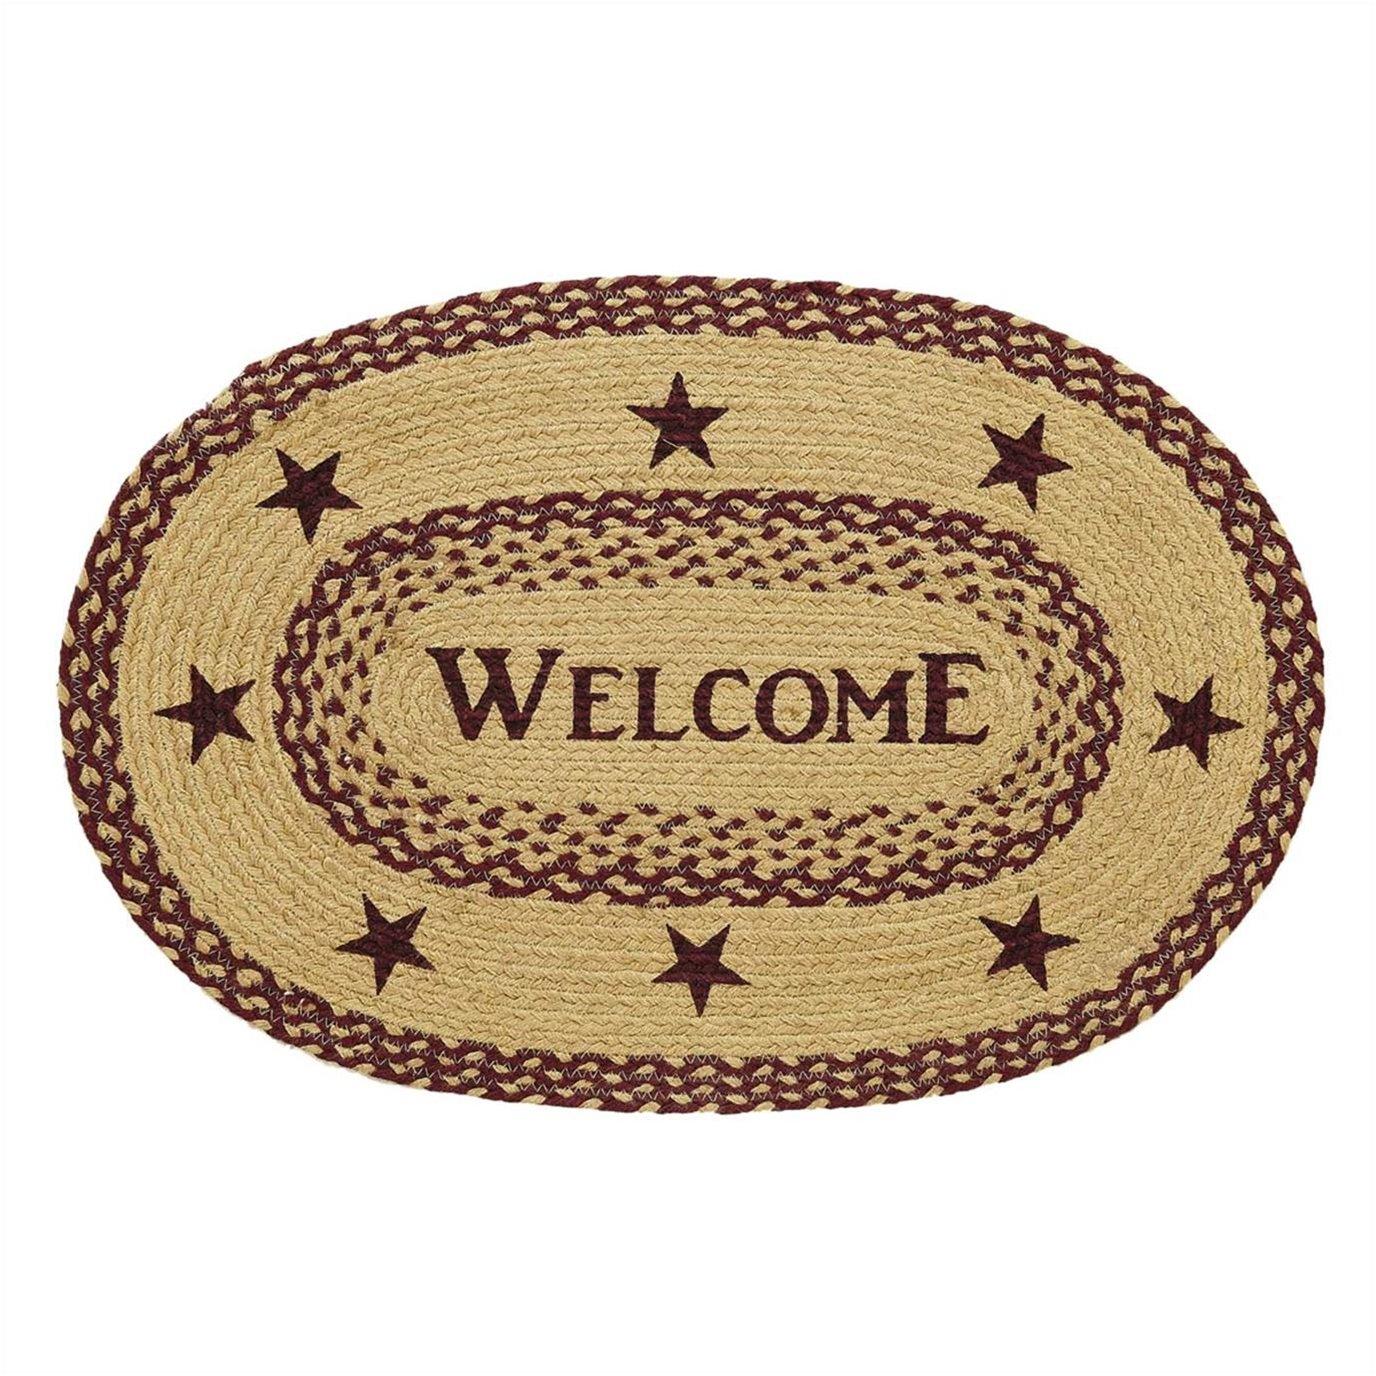 Burgundy Tan Jute Rug Oval Welcome 20x30